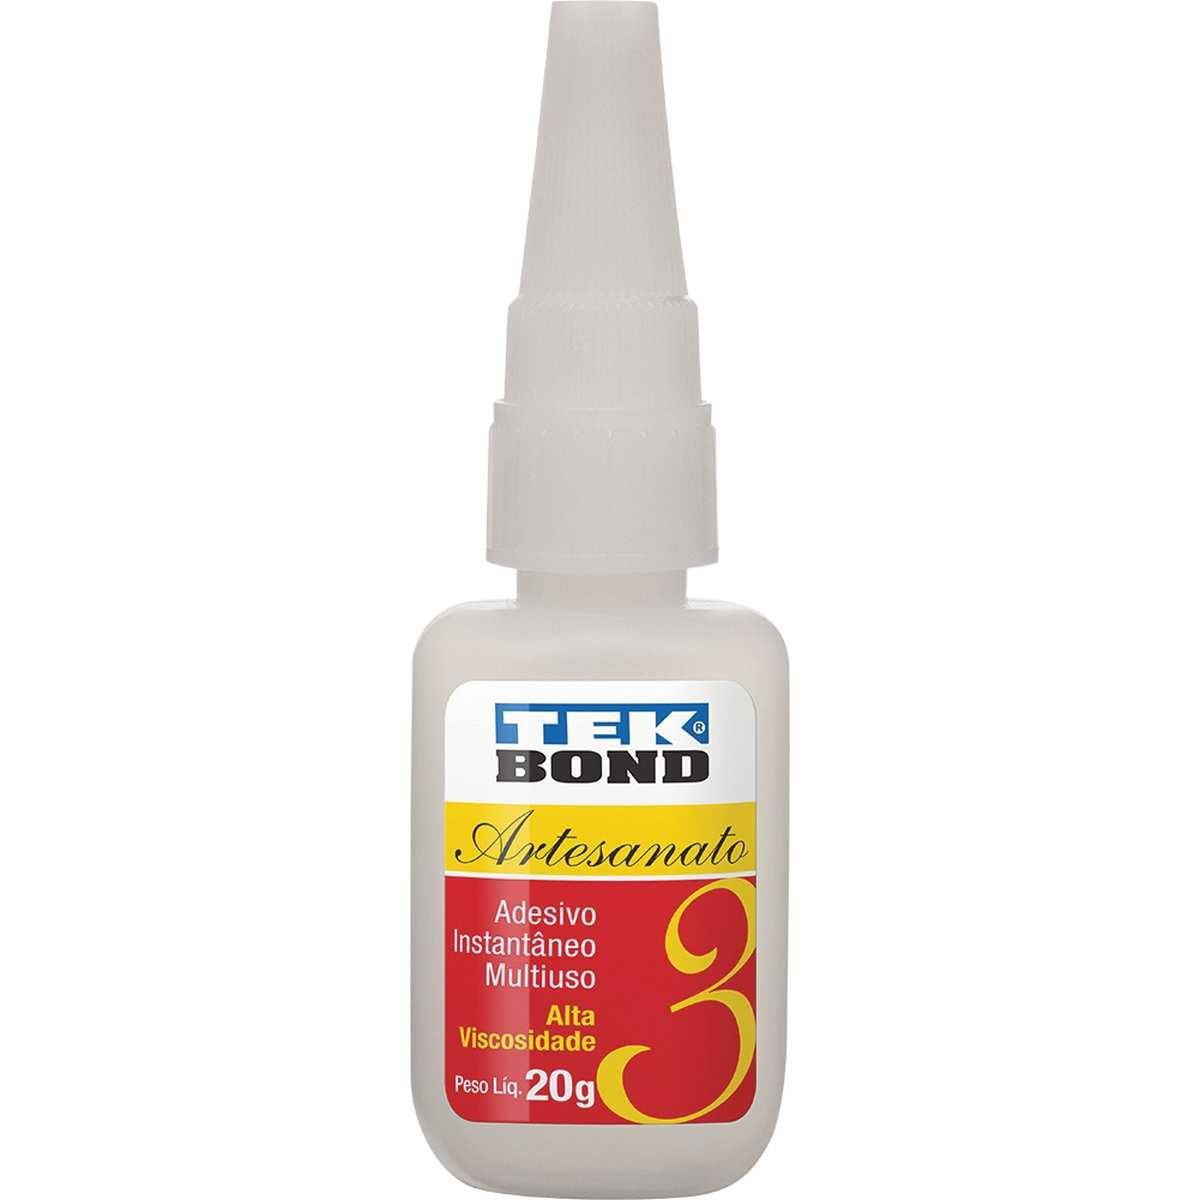 Cola adesivo instantâneo - Artesanado 3 - 20g - Tekbond